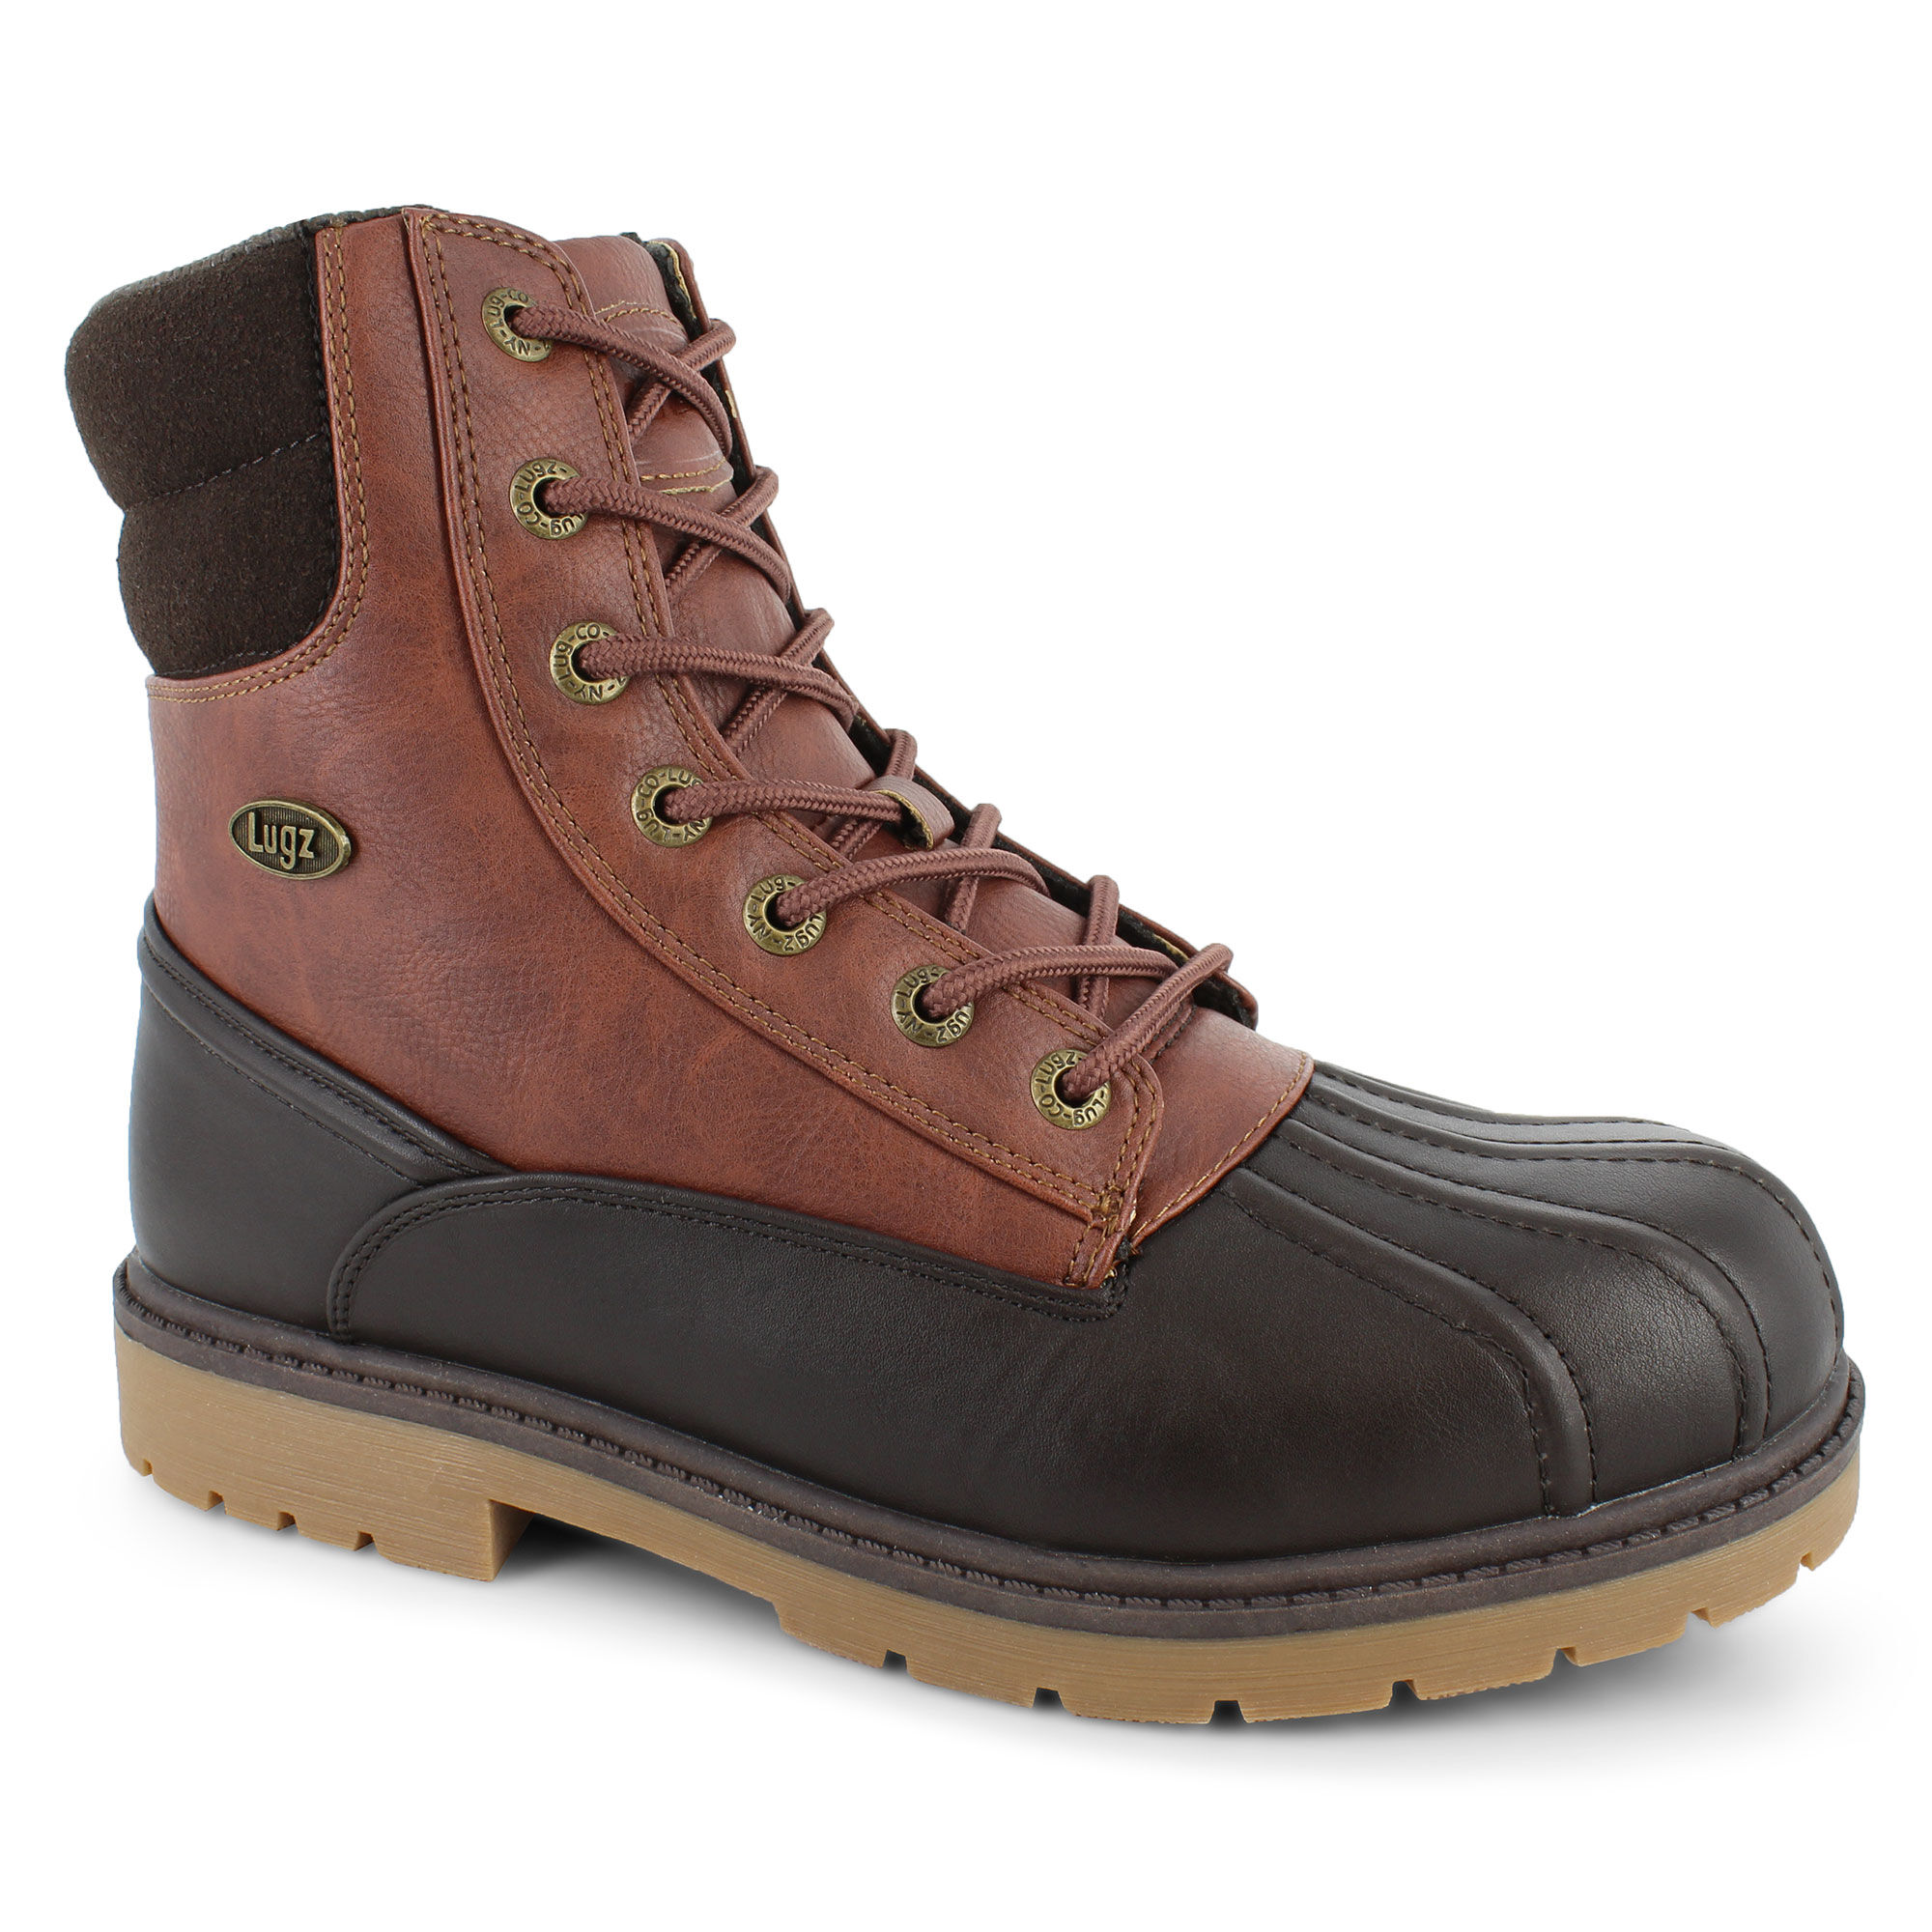 Men's Outdoor Boots   Shop Now at SHOE